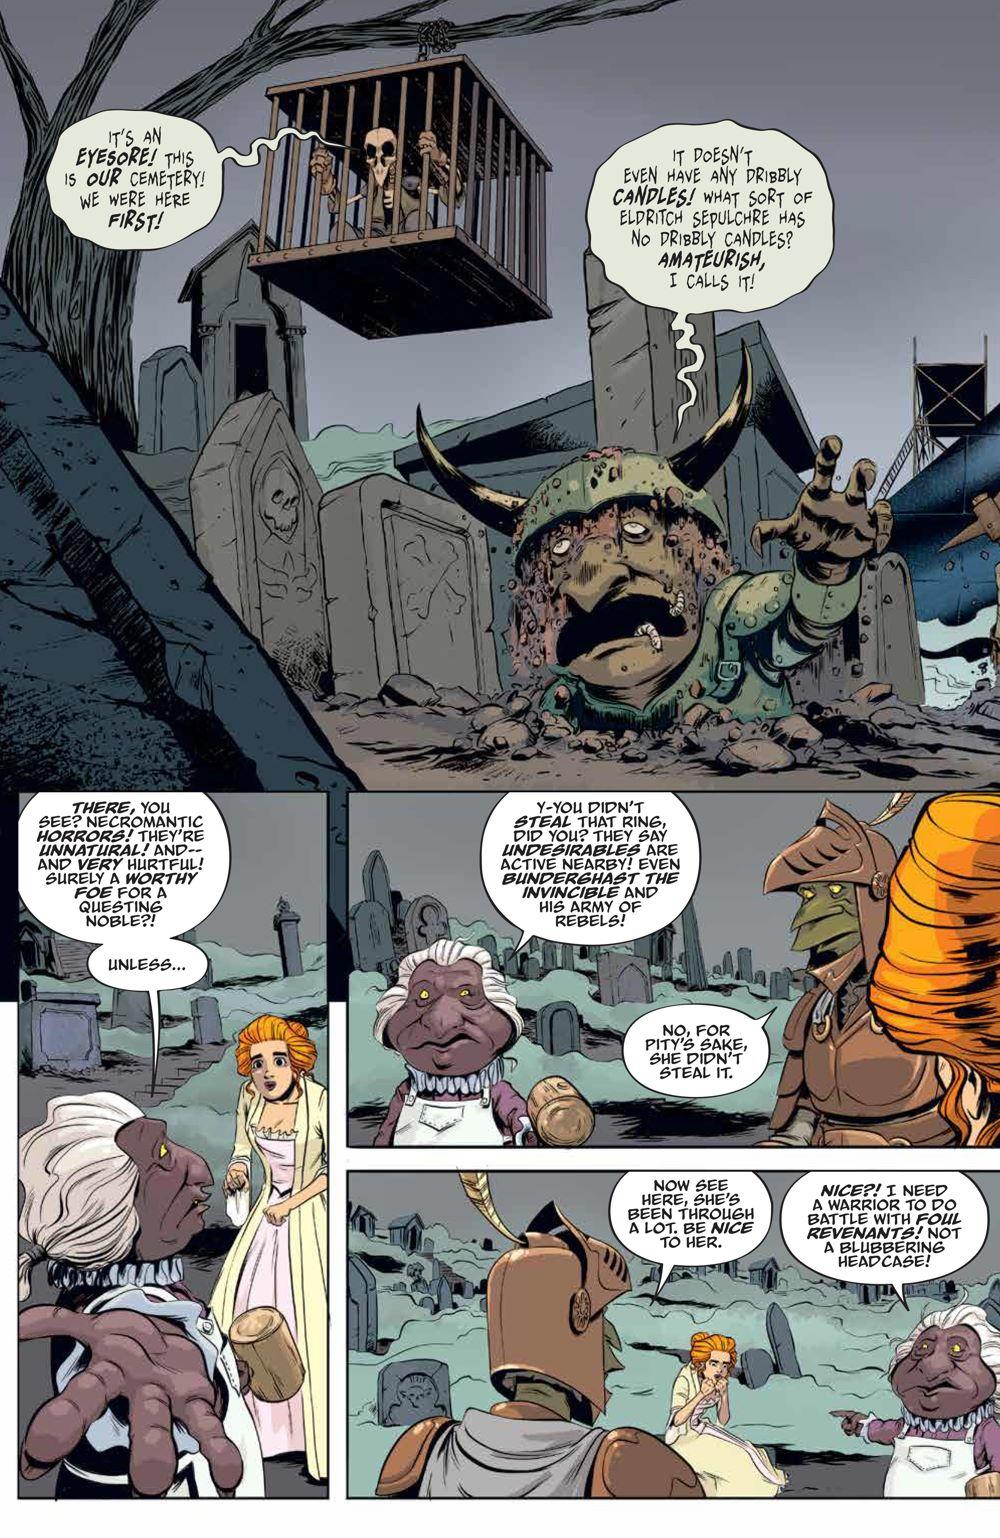 LabyrinthCoronation_v2_SC_PRESS_18 ComicList Previews: JIM HENSON'S LABYRINTH CORONATION VOLUME 2 TP